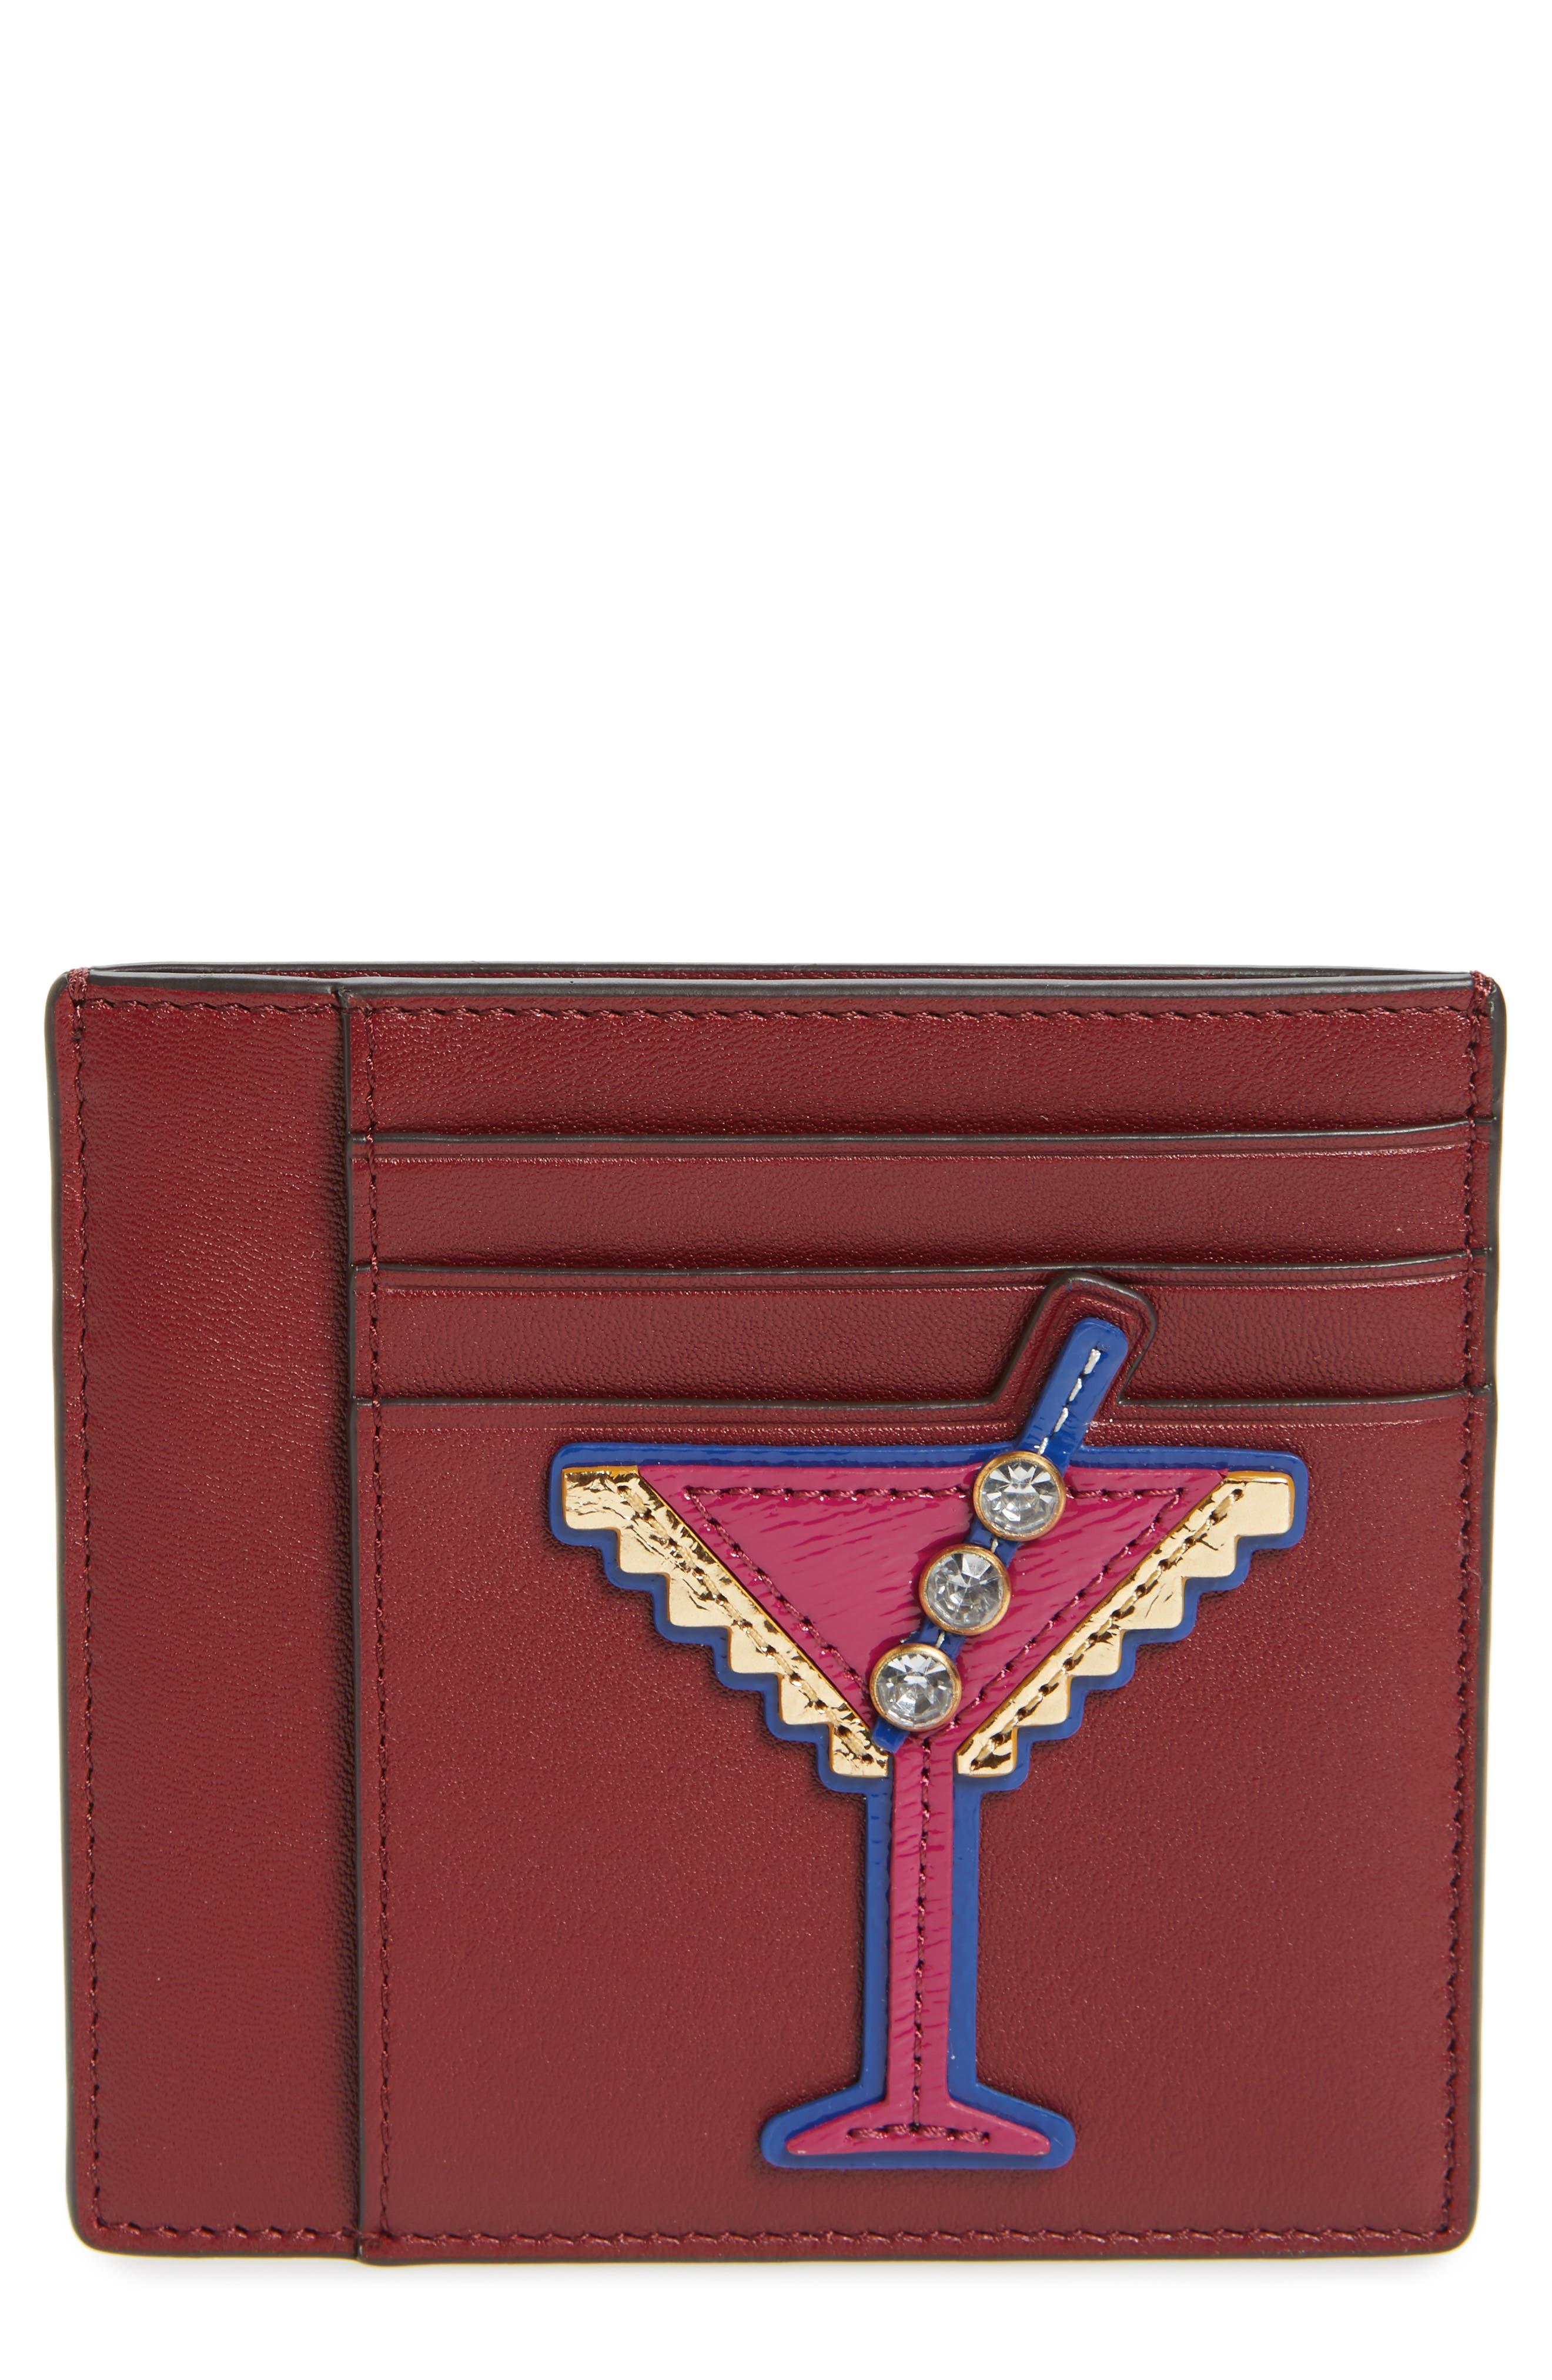 Tory Burch Martini Appliqué Leather Card Case